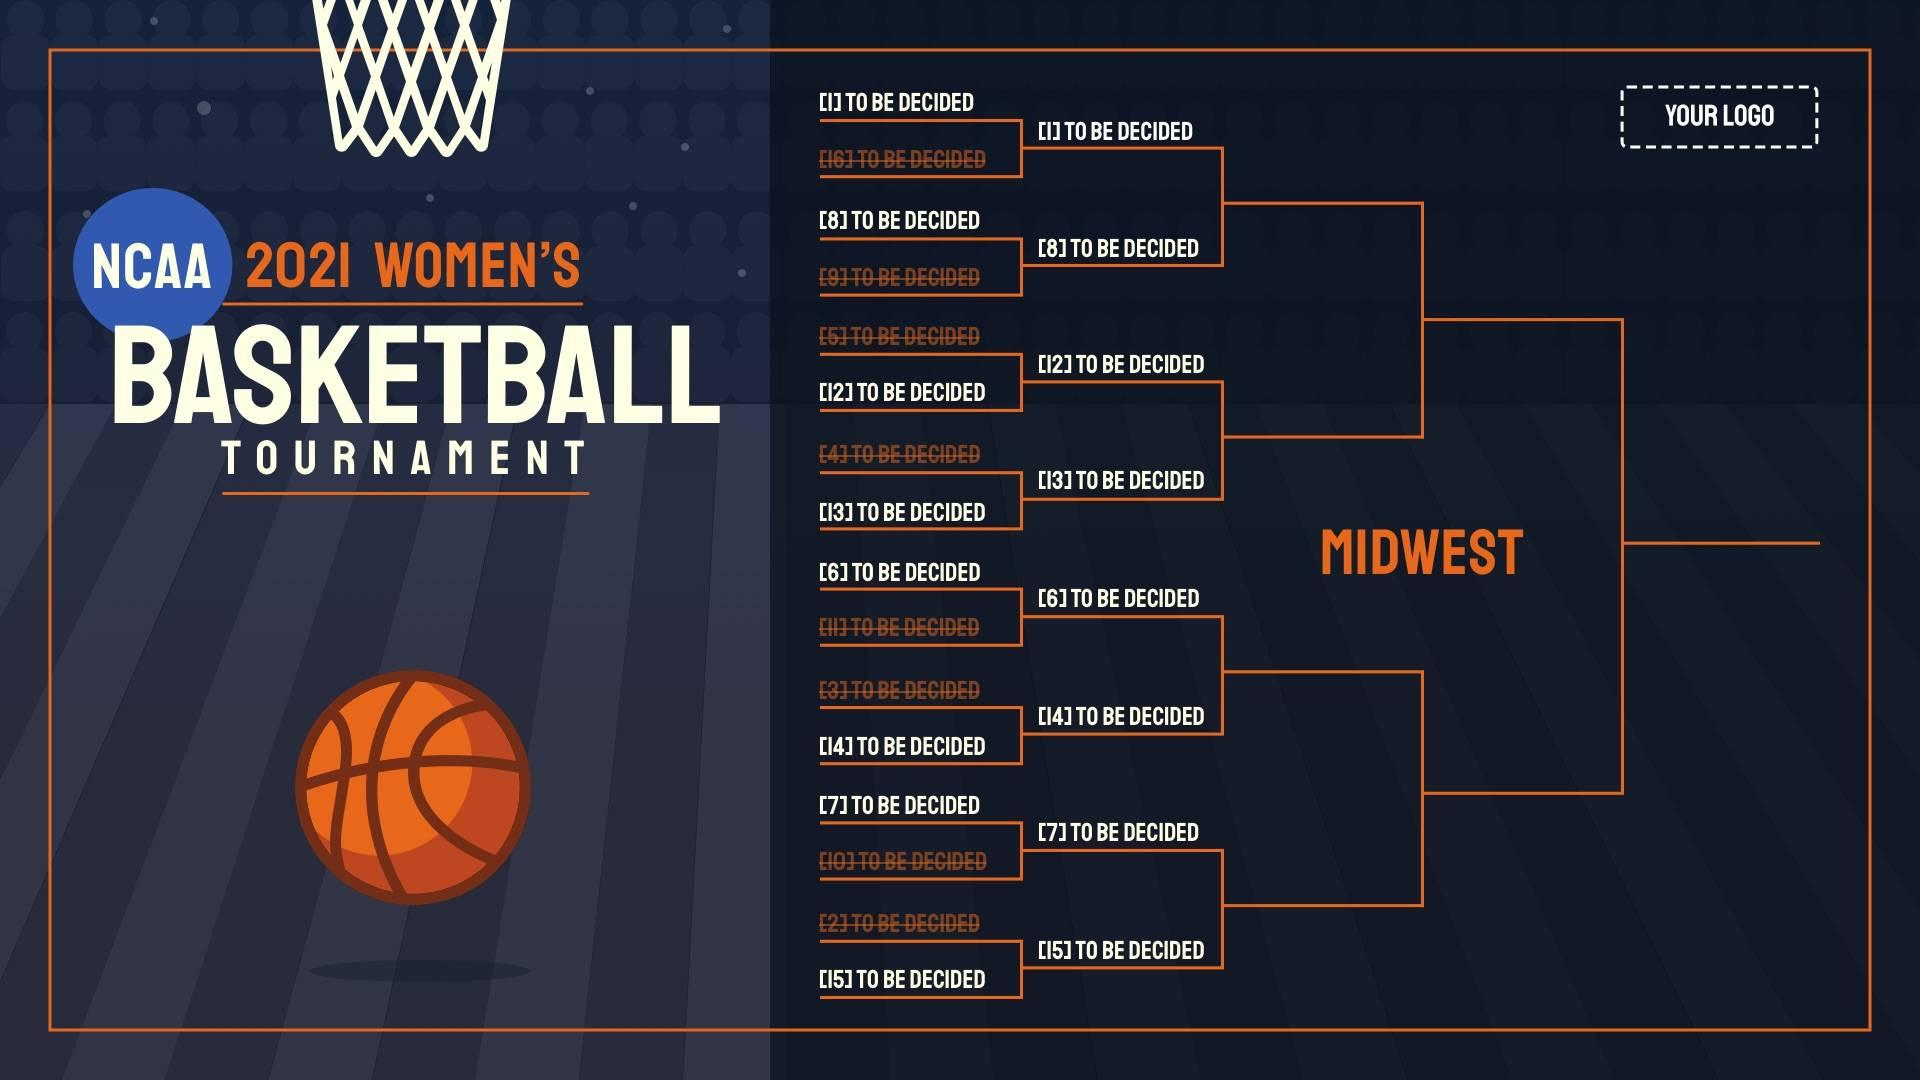 2021 NCAA Women's Tournament Digital Signage Template